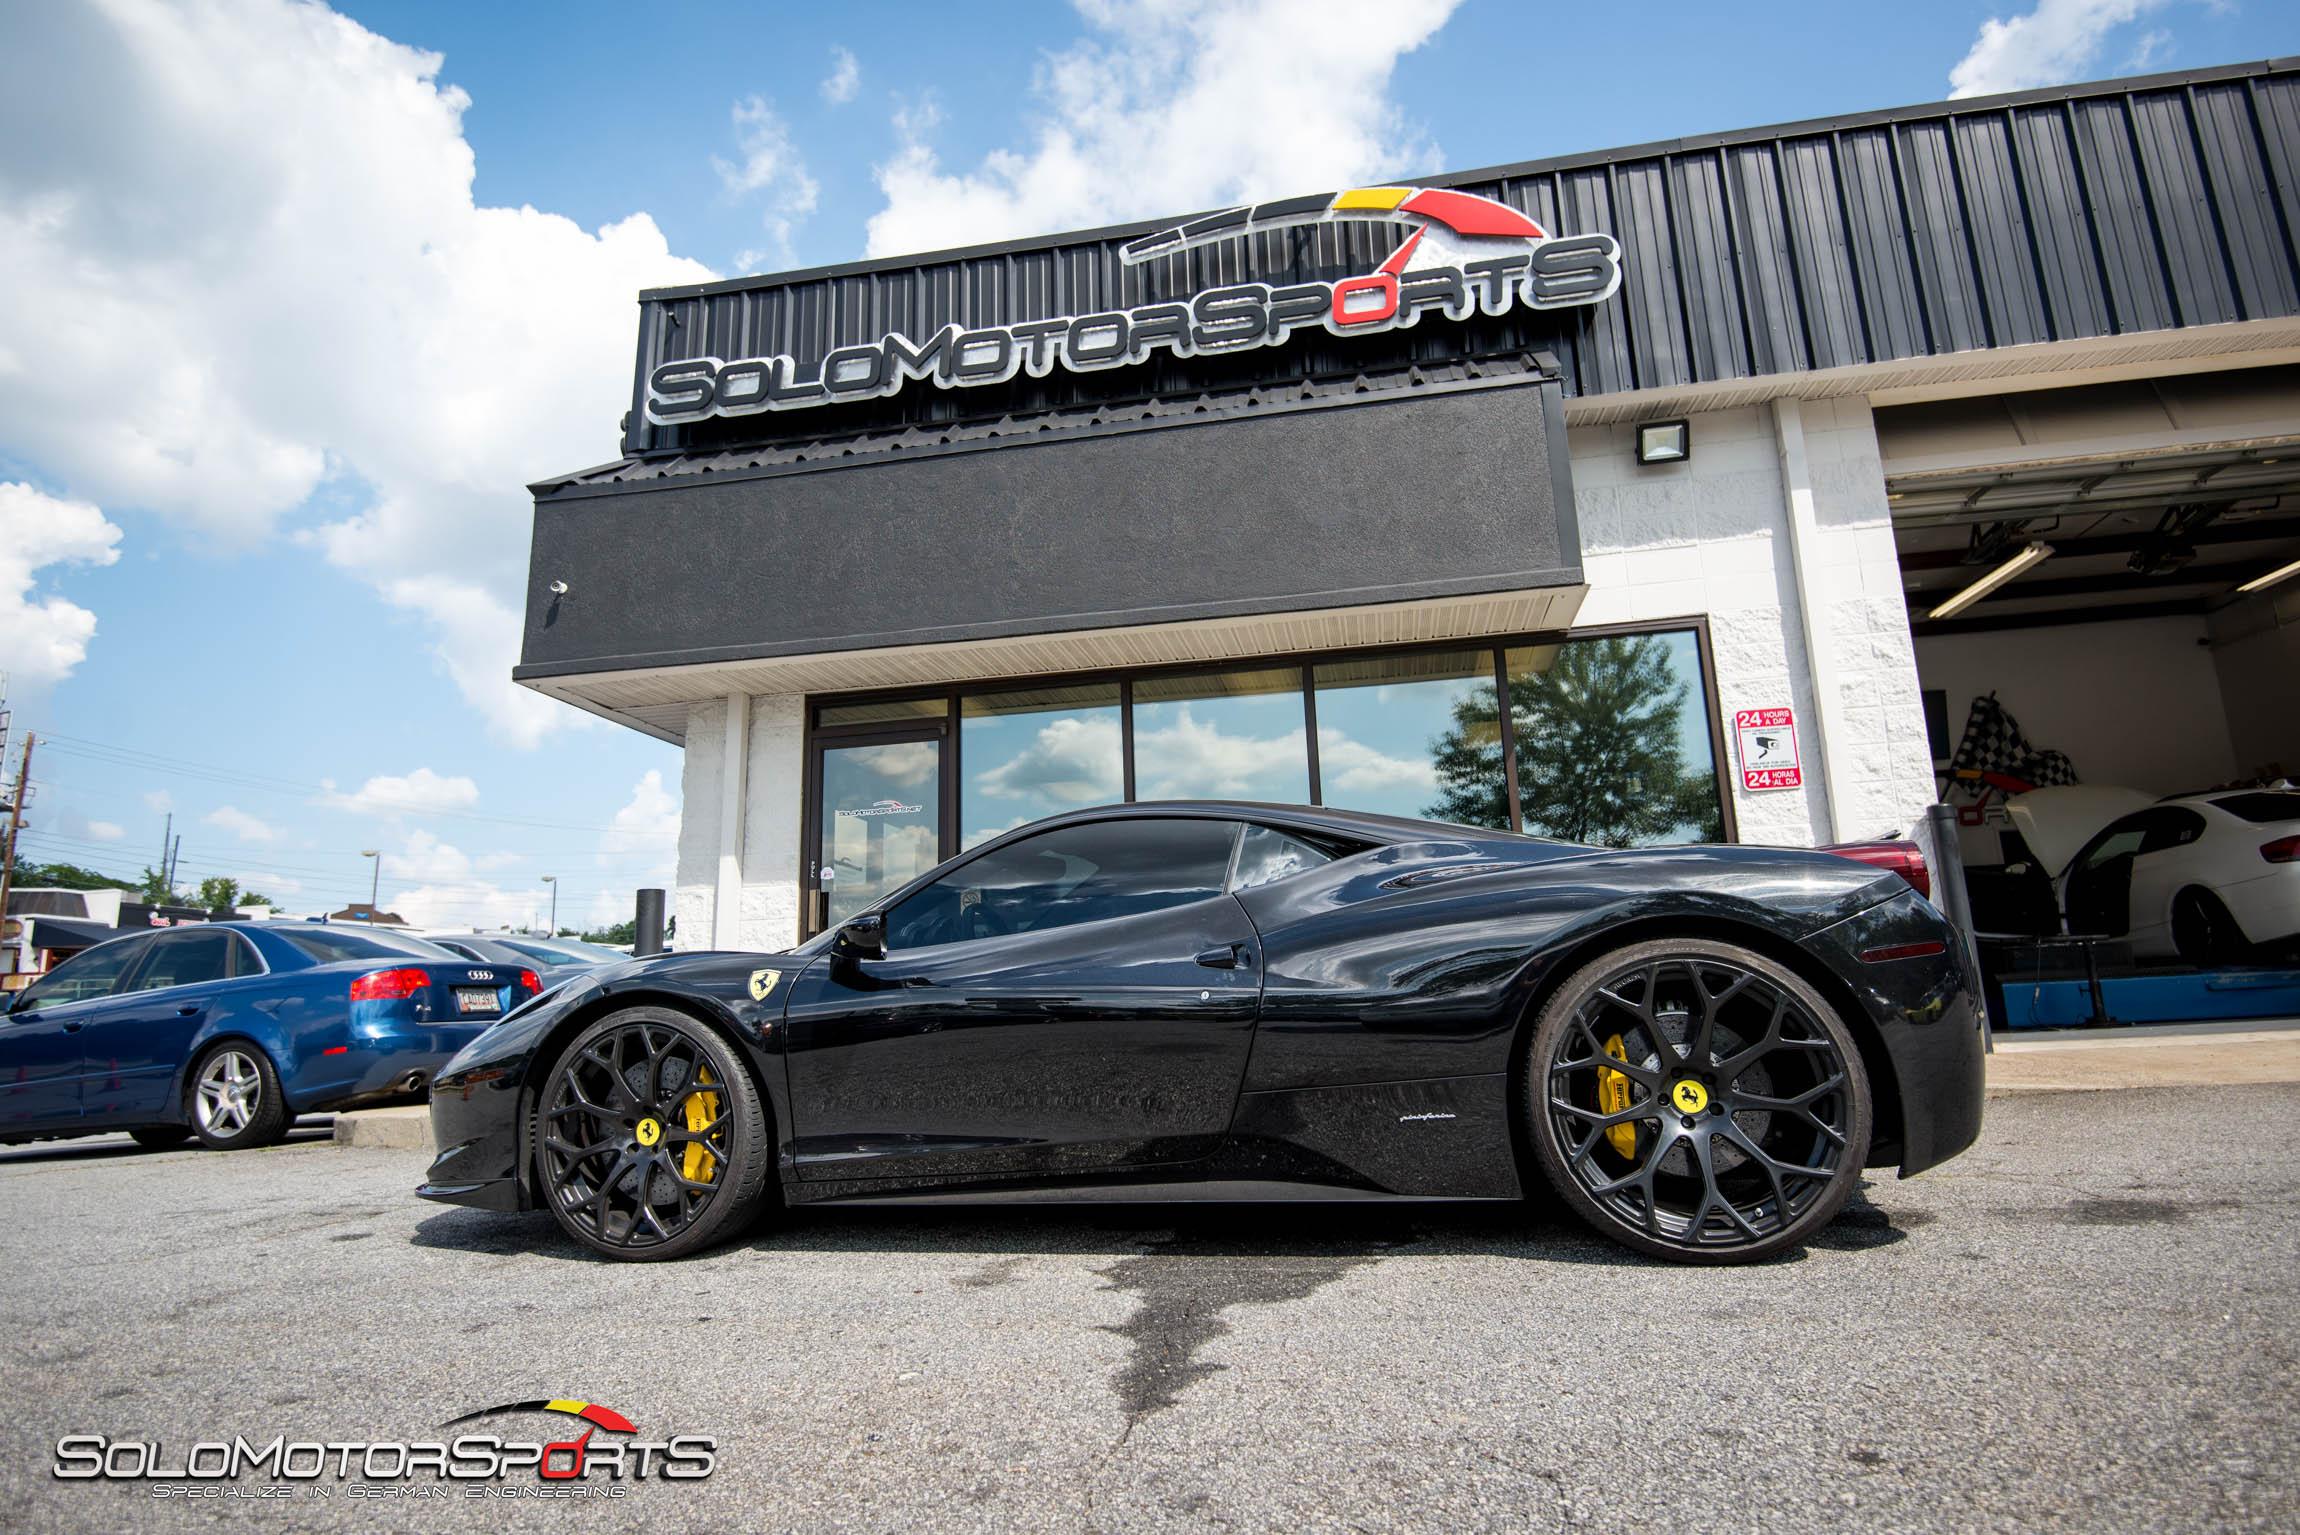 Ferrari, Italia, 458, Brake job, stealership, exotics